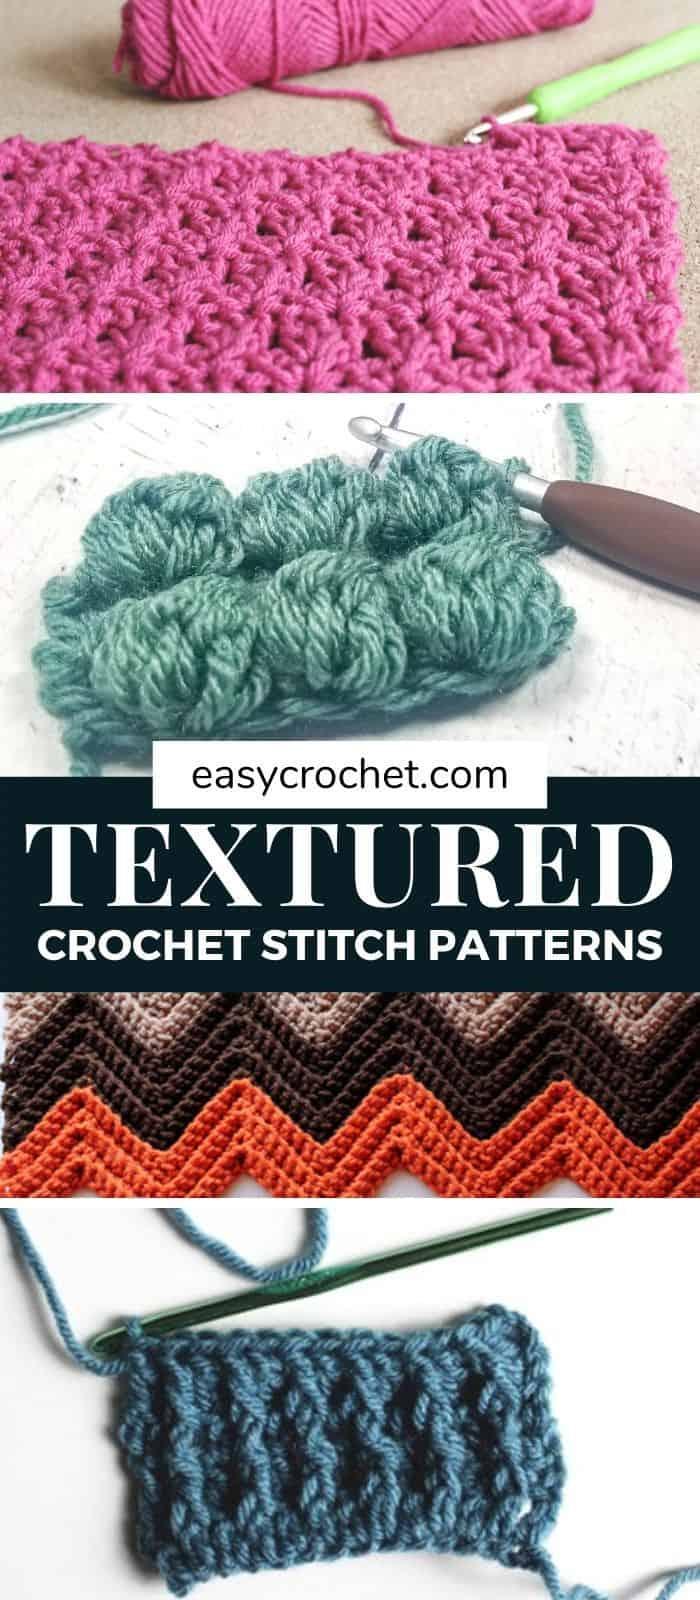 Textured Crochet Stitches via @easycrochetcom